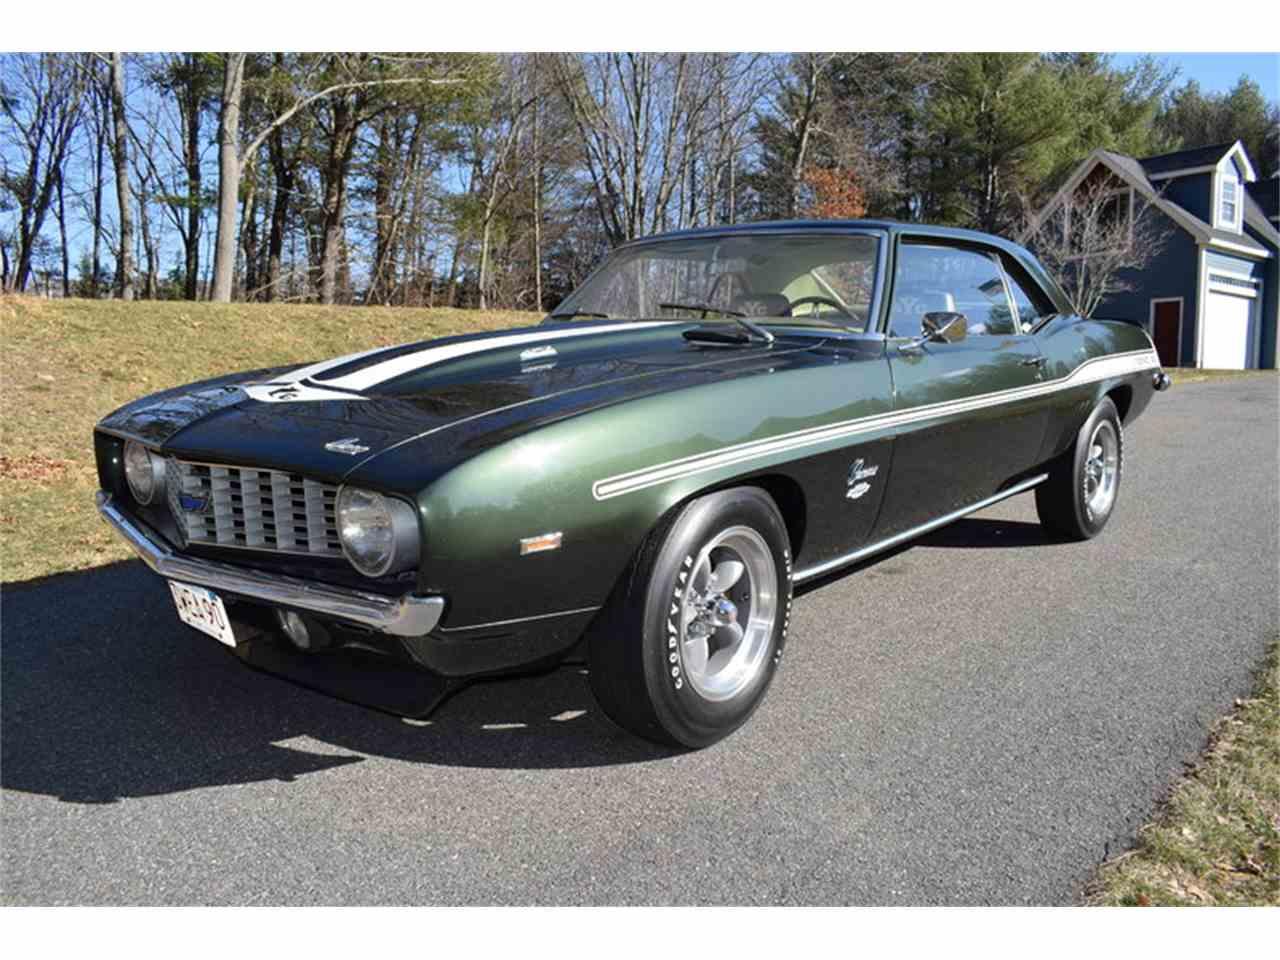 Copo Camaro For Sale >> 1969 Chevrolet Camaro COPO for Sale | ClassicCars.com | CC-961808